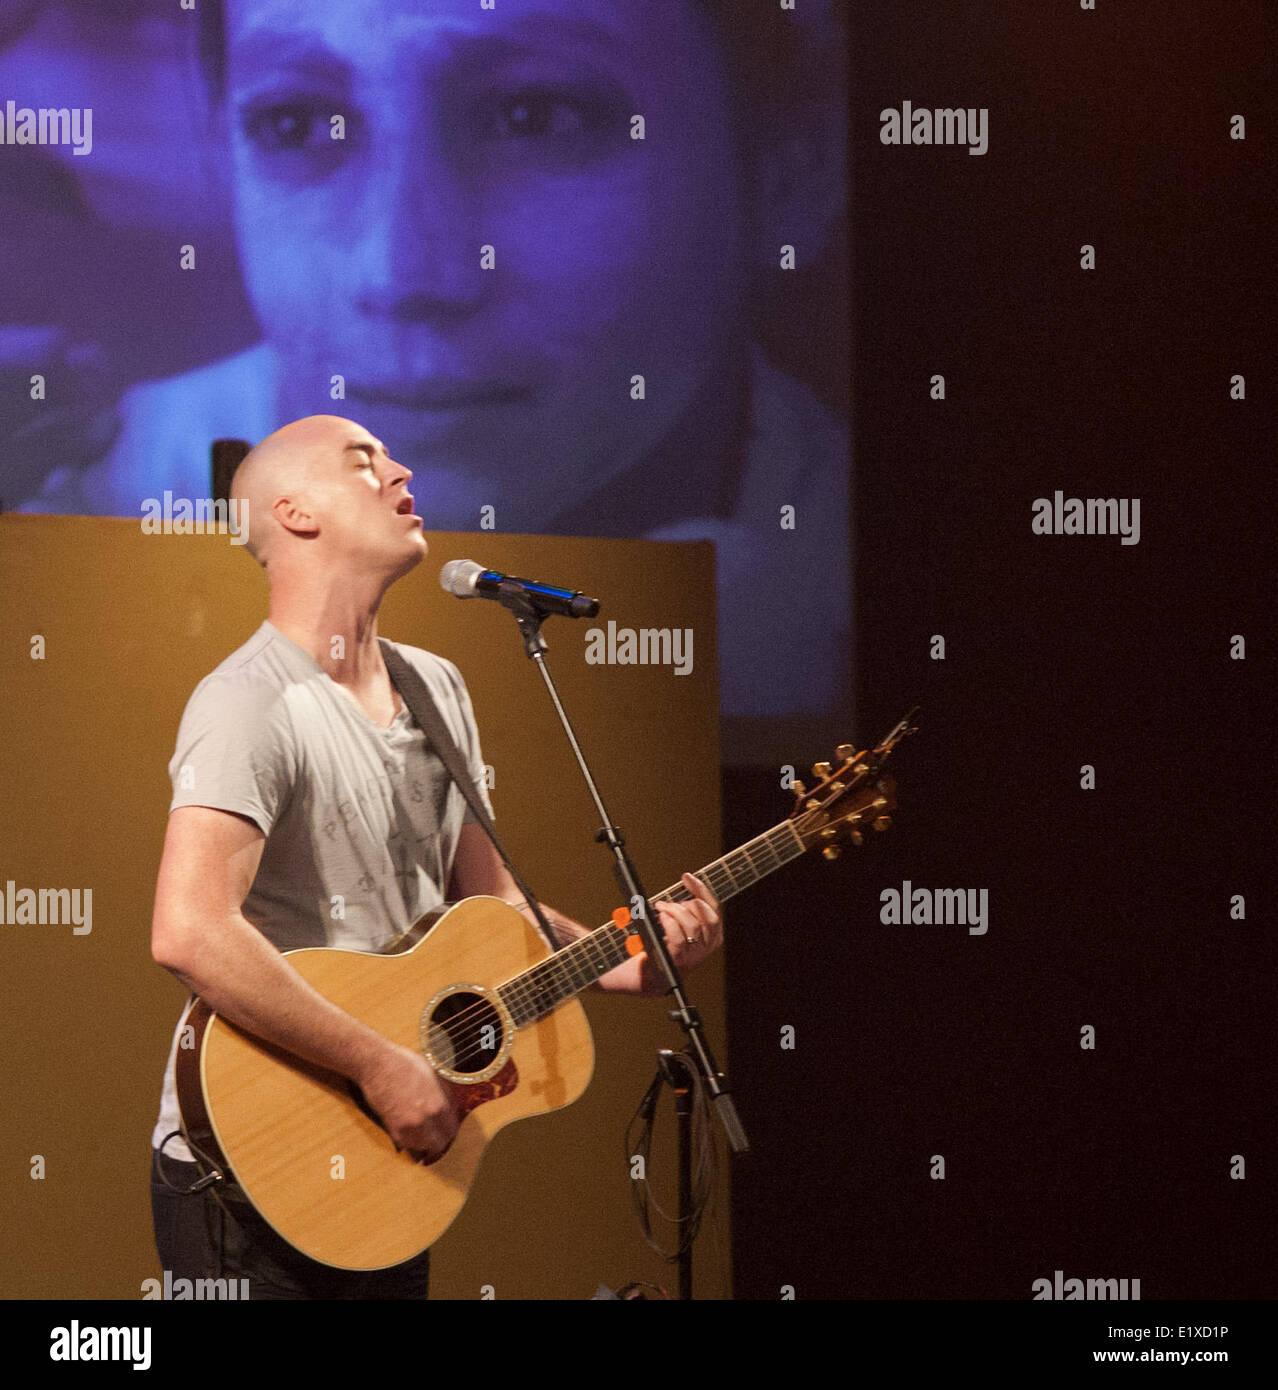 28. Juni 2013 - Dana Point/Capistrano Beach, Kalifornien, US - Singer-Songwriter Tyrone Wells führt über Stockbild